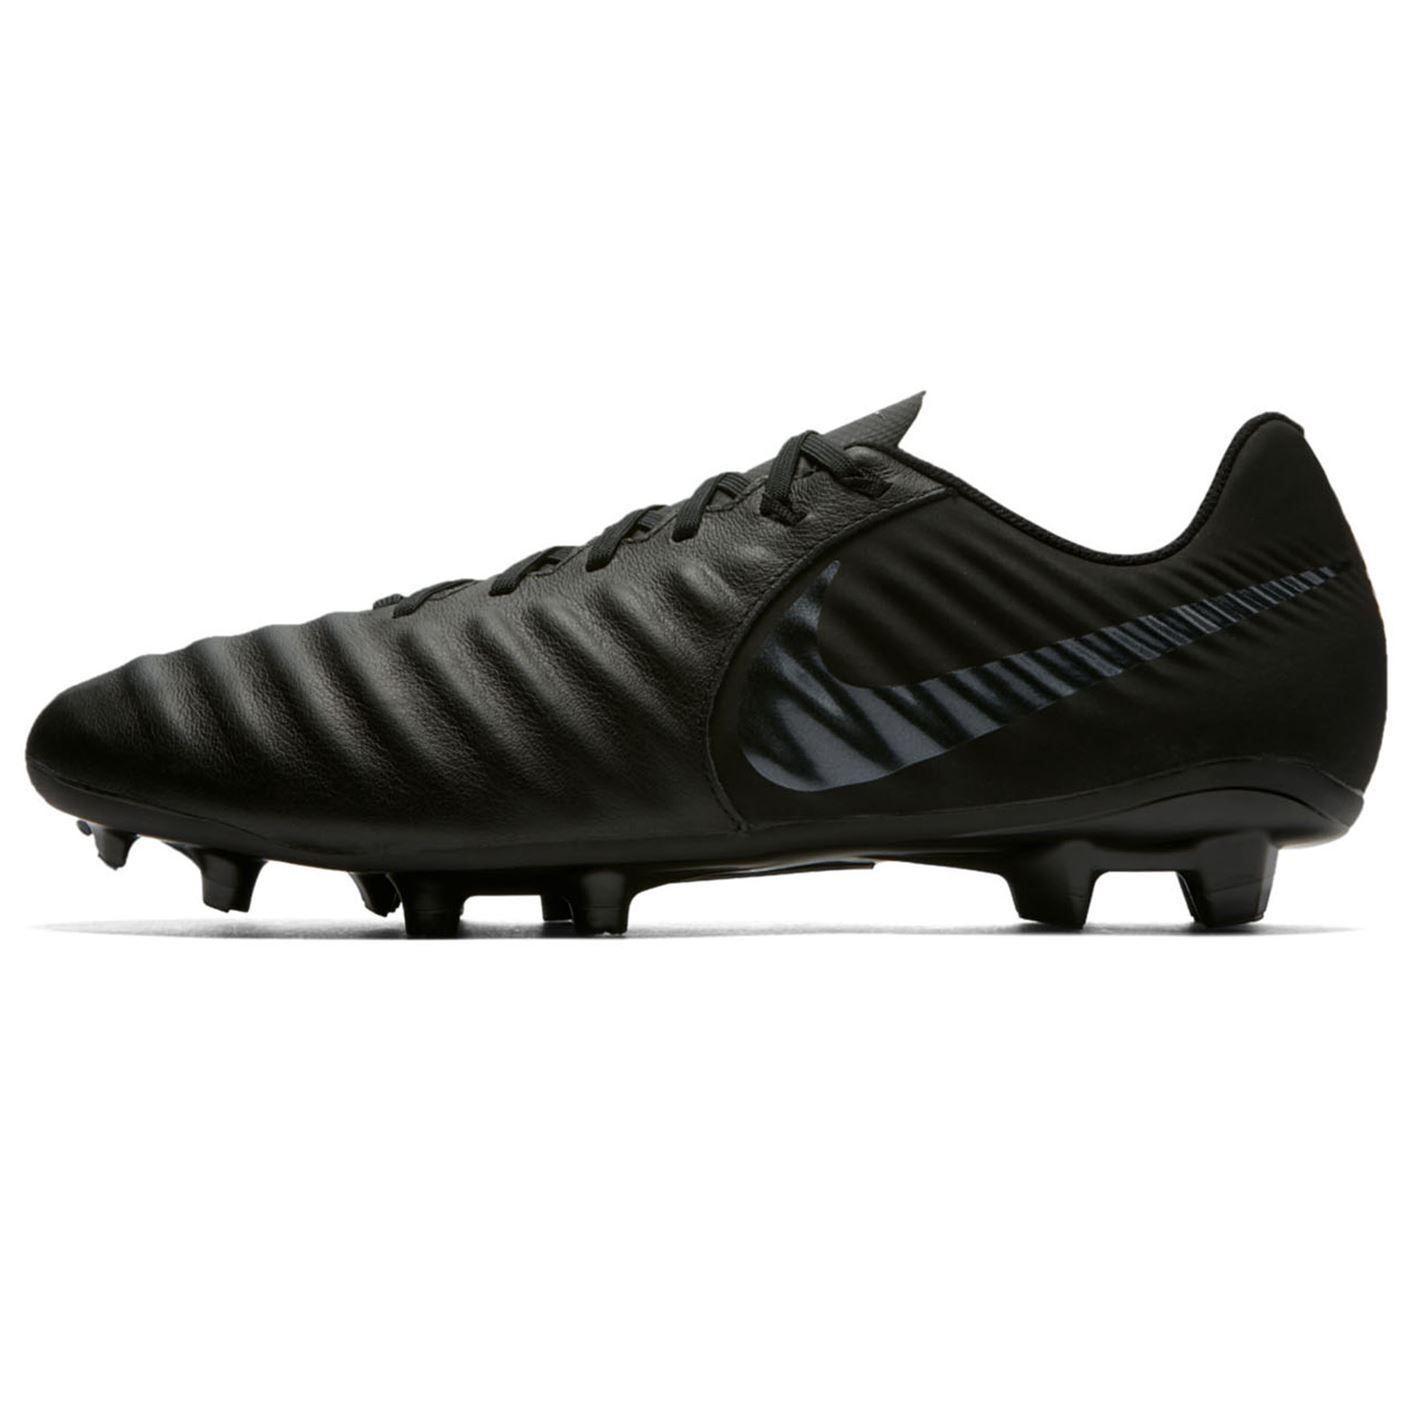 miniature 9 - Nike-Tiempo-Legend-Academy-FG-Firm-Ground-Chaussures-De-Football-Homme-Football-Chaussures-Crampons